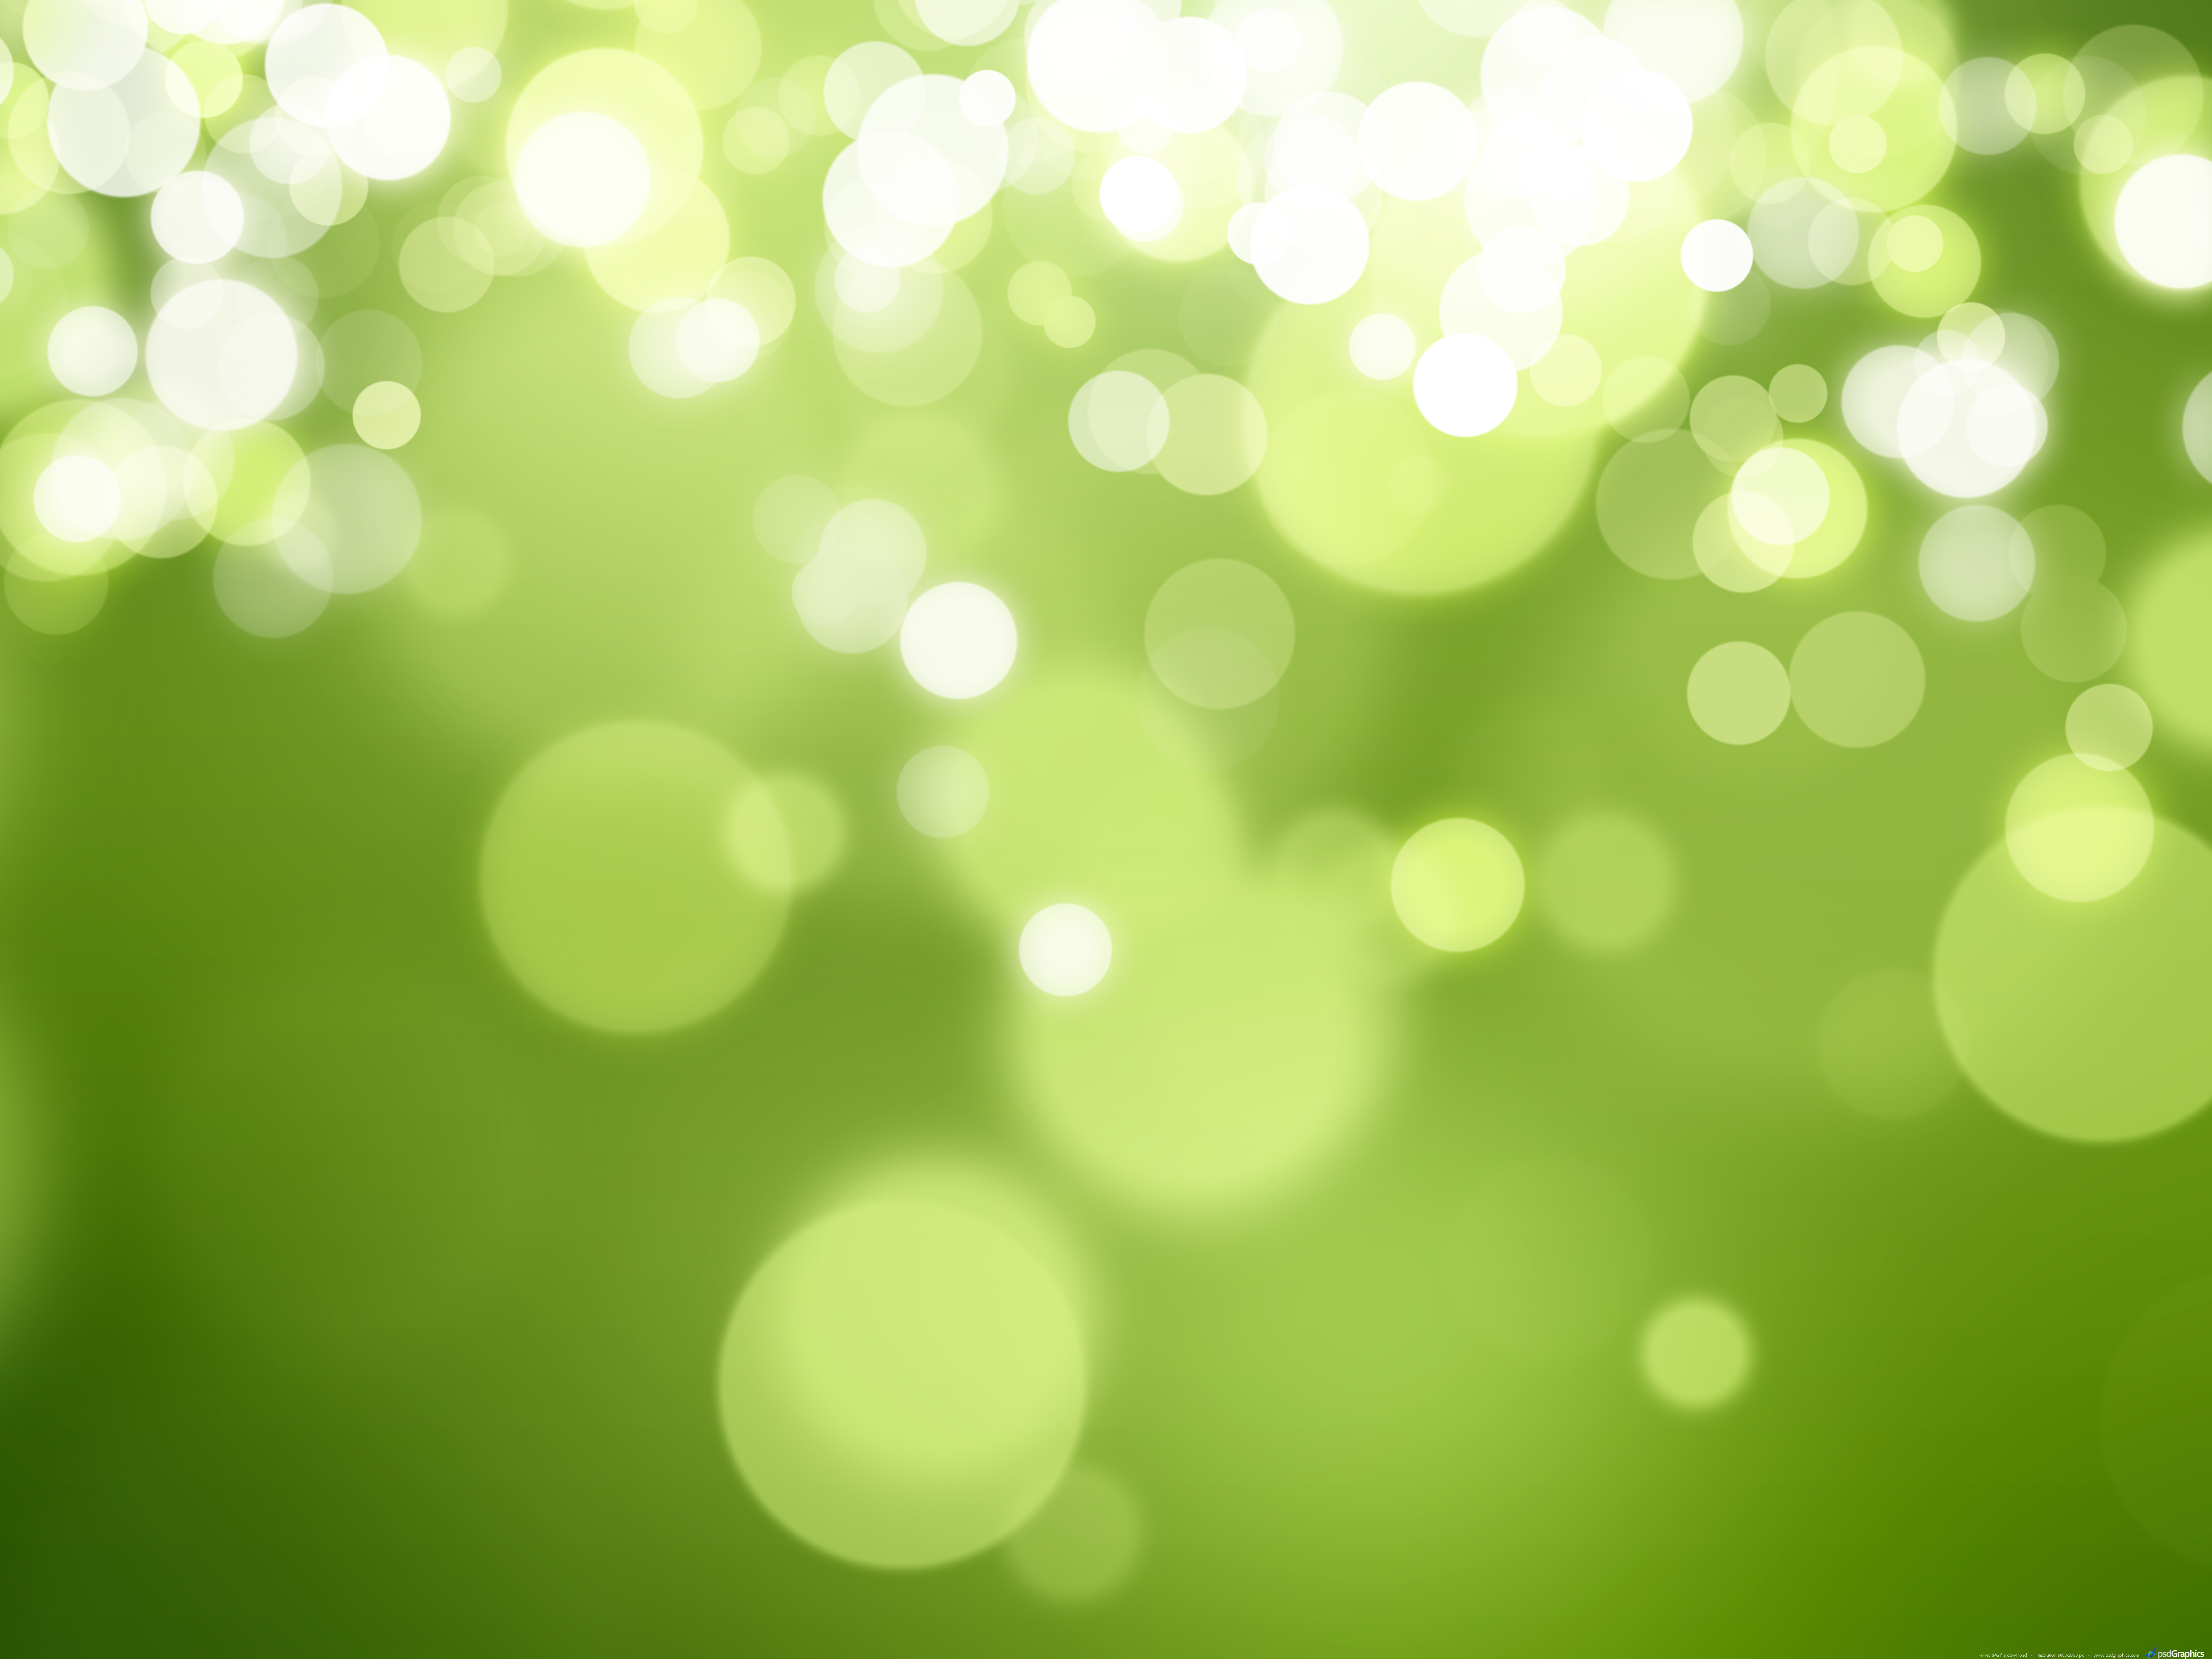 green design blurry lights background eco friendly green background 5000x3750